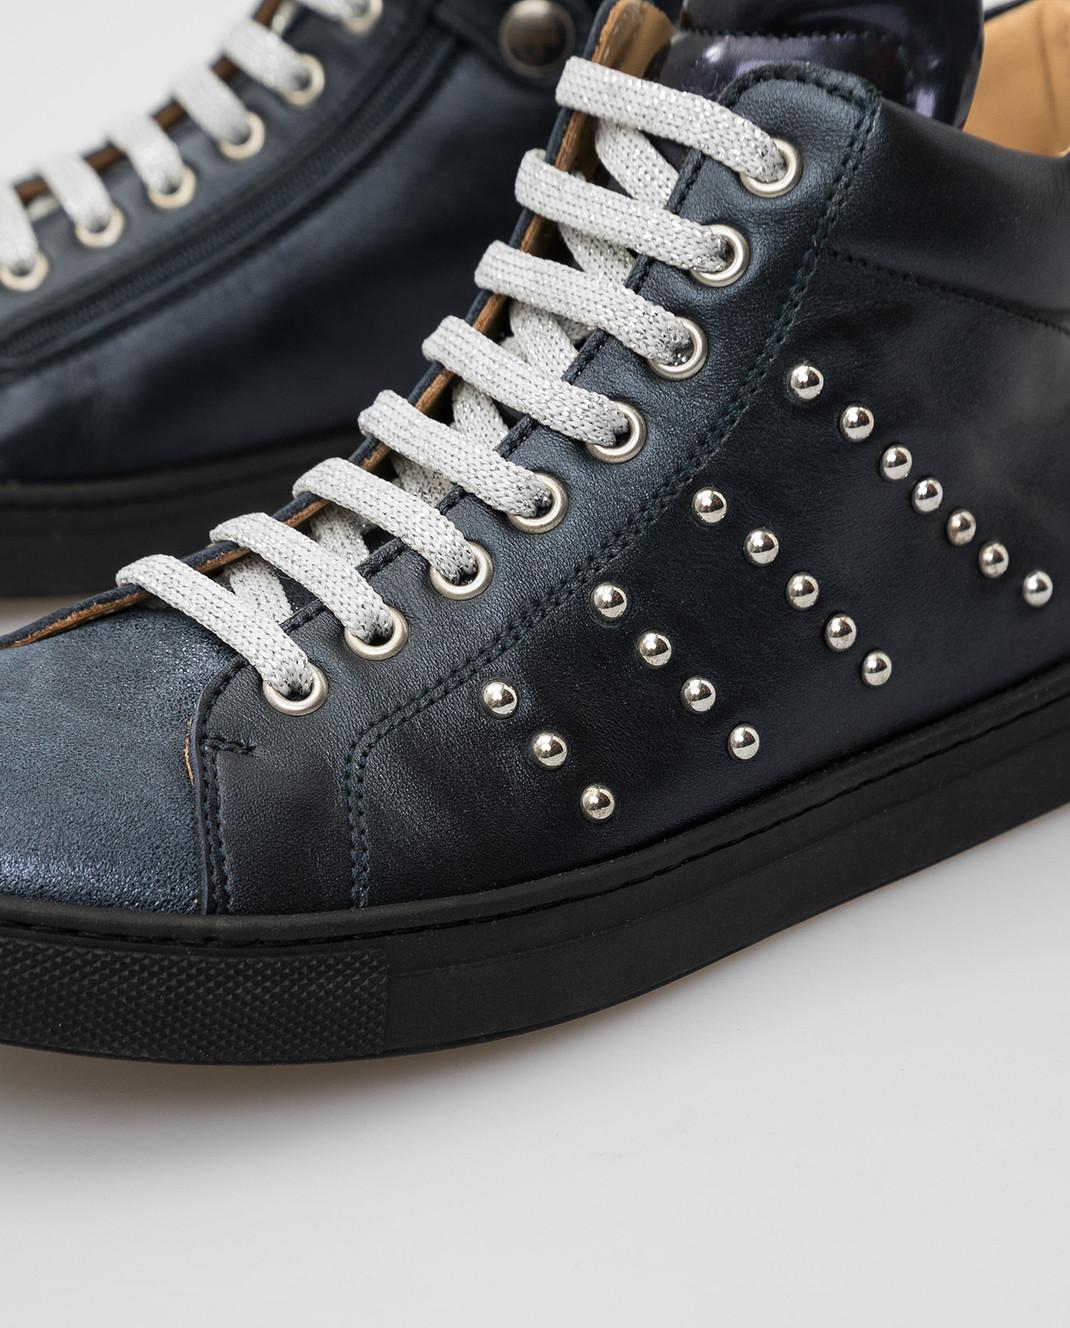 Zecchino D'oro Детские темно-синие сникеры F1545713639 изображение 4